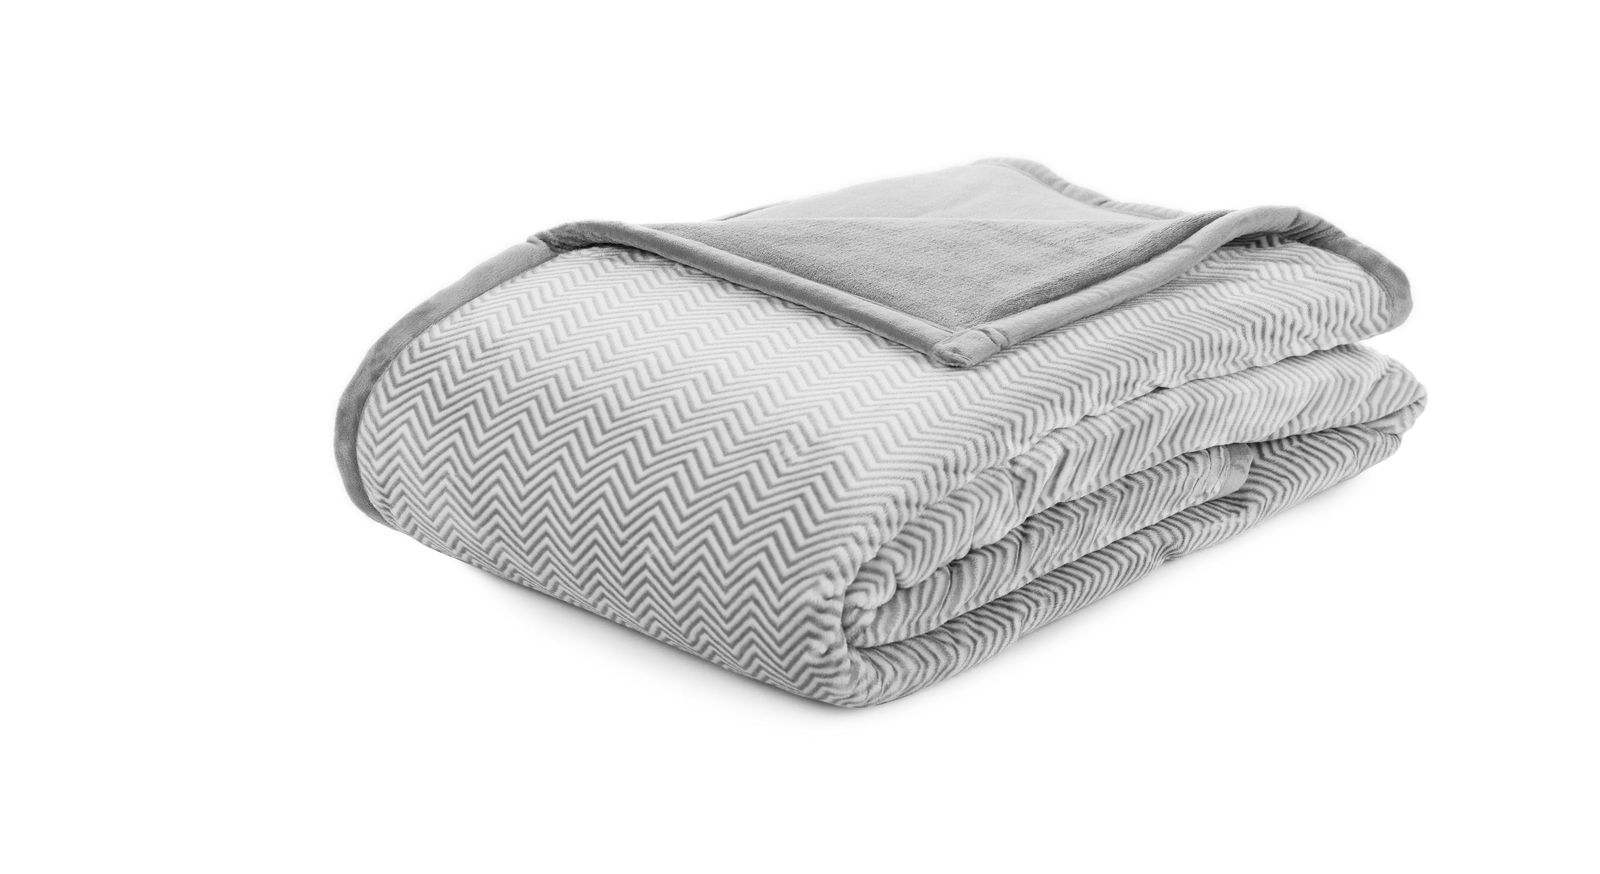 Silberne Wohndecke Zackenspiel in 150x200 cm